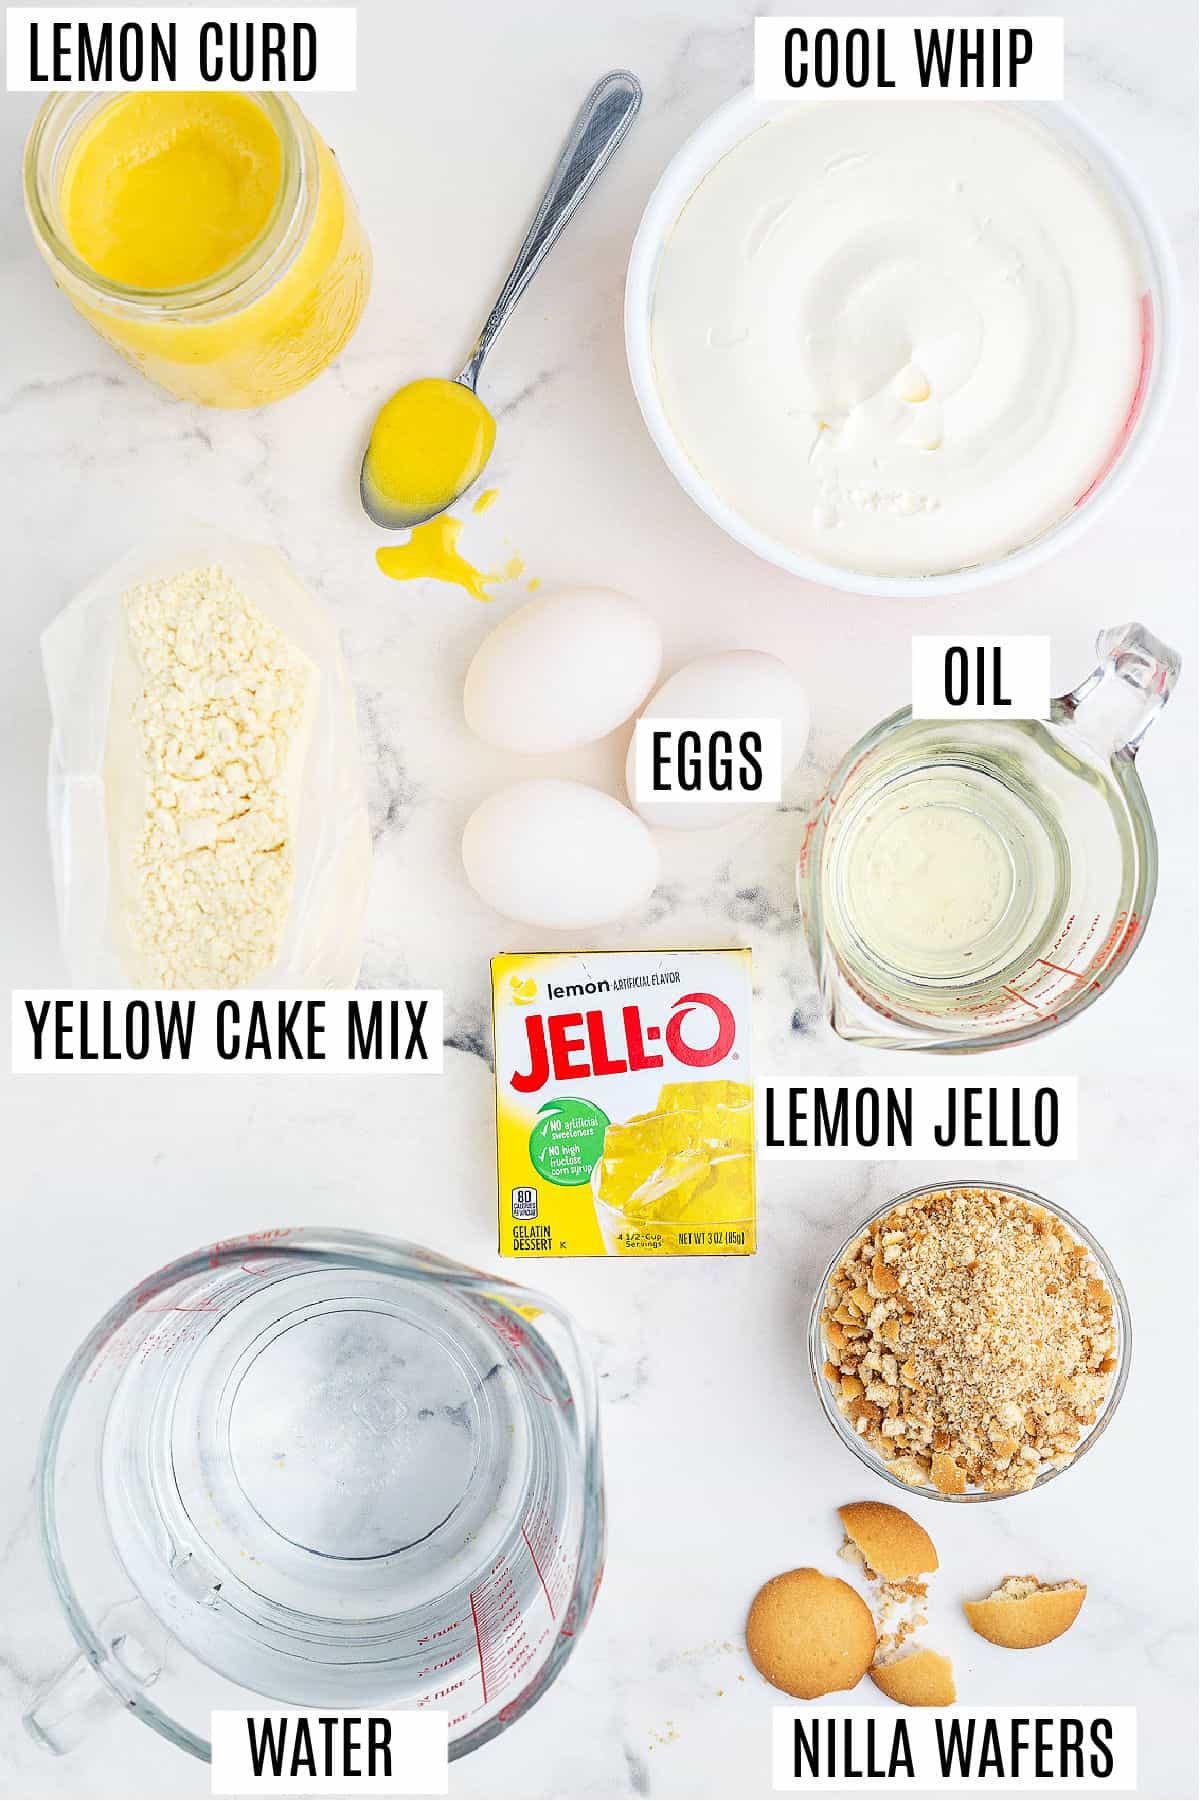 Ingredients needed to make a lemon jello poke cake recipe.